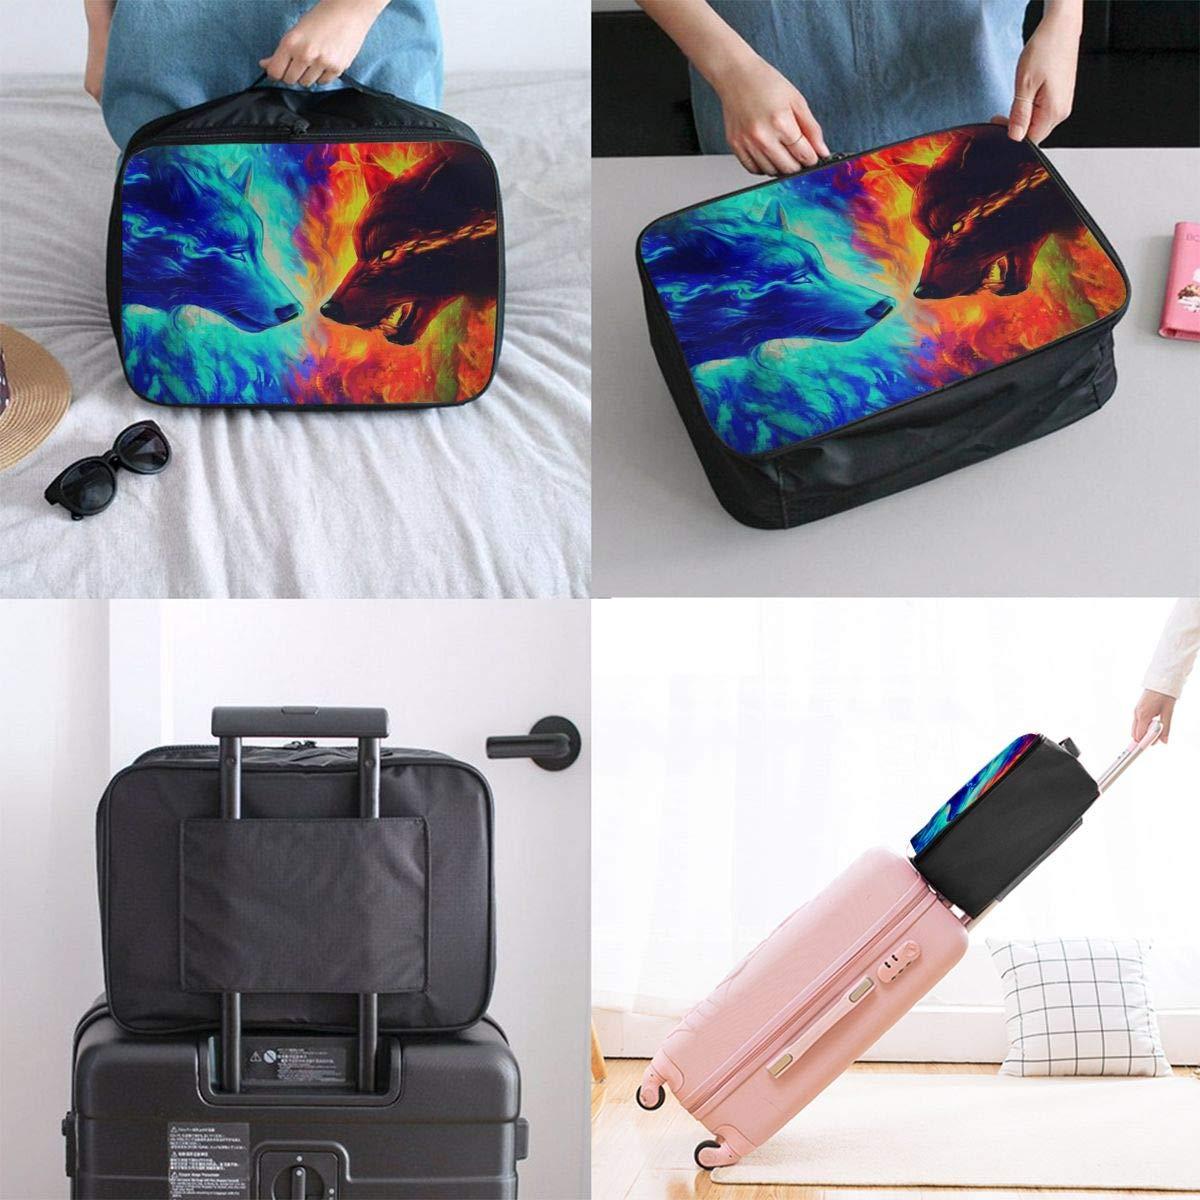 3D Creative Wolf Galaxy Travel Bag Men Women 3D Print Pattern Gift Portable Waterproof Oxford Cloth Luggage Bag